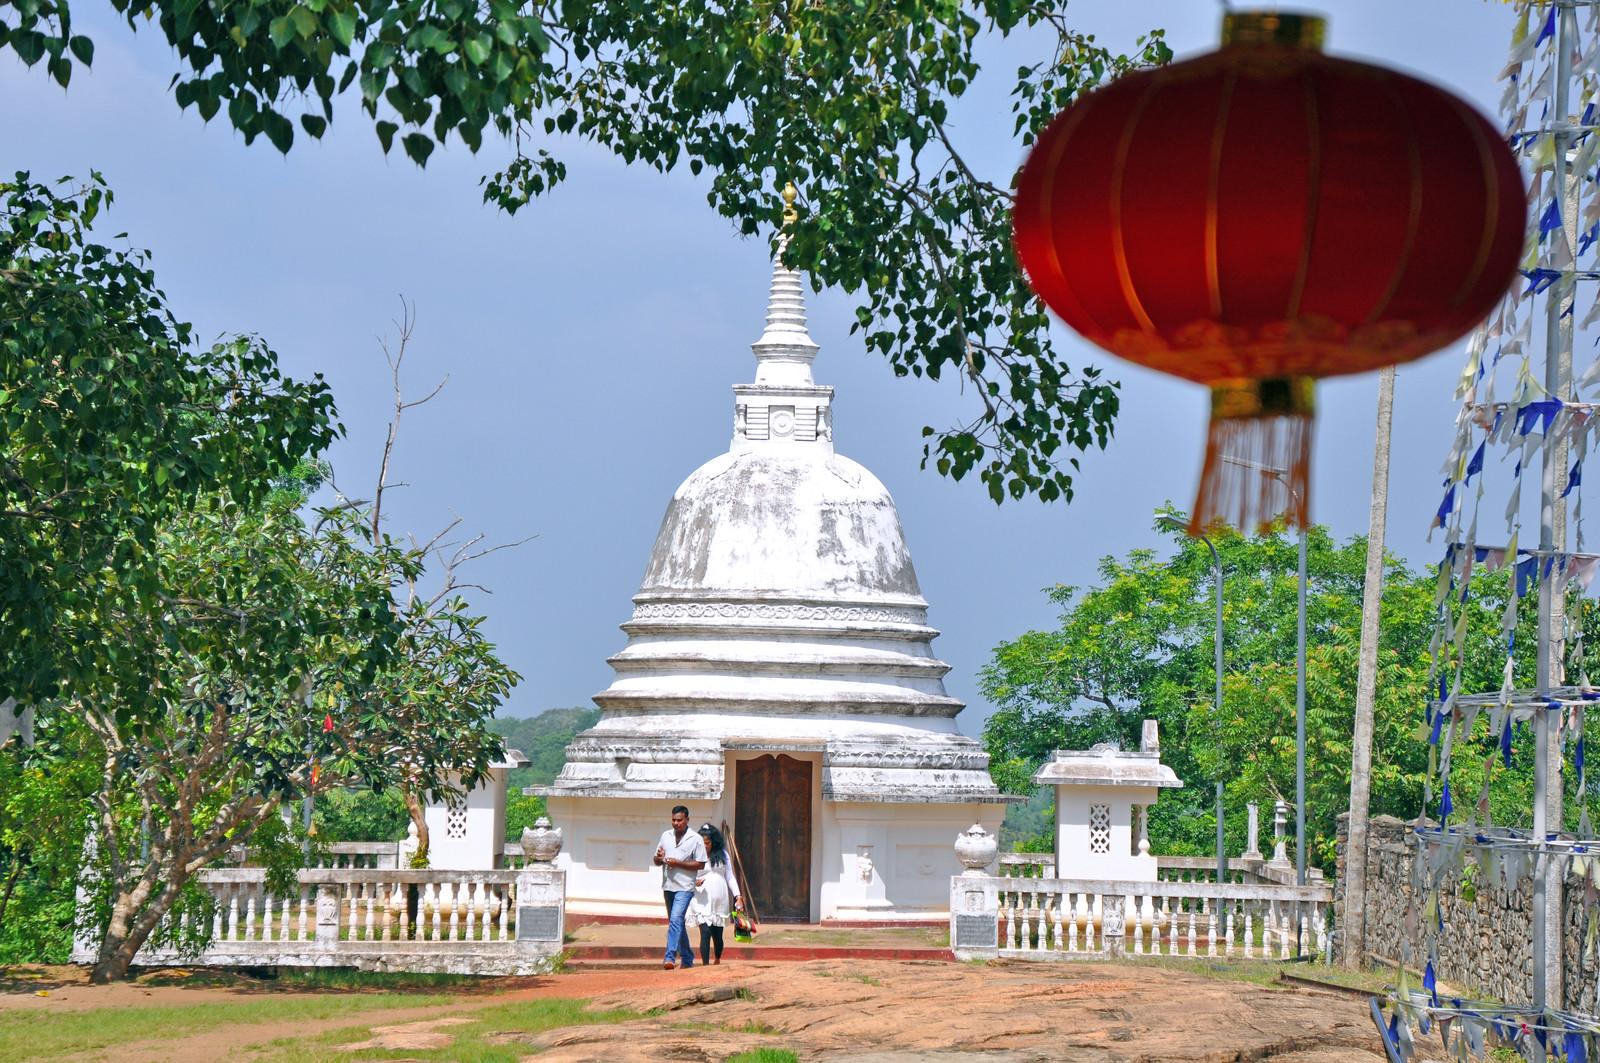 Aukana, la estatua de Buda más alta de Sri Lanka buda de aukana - 46056528164 380fa5fdca h - Buda de Aukana, la estatua de Buda más alta de Sri Lanka